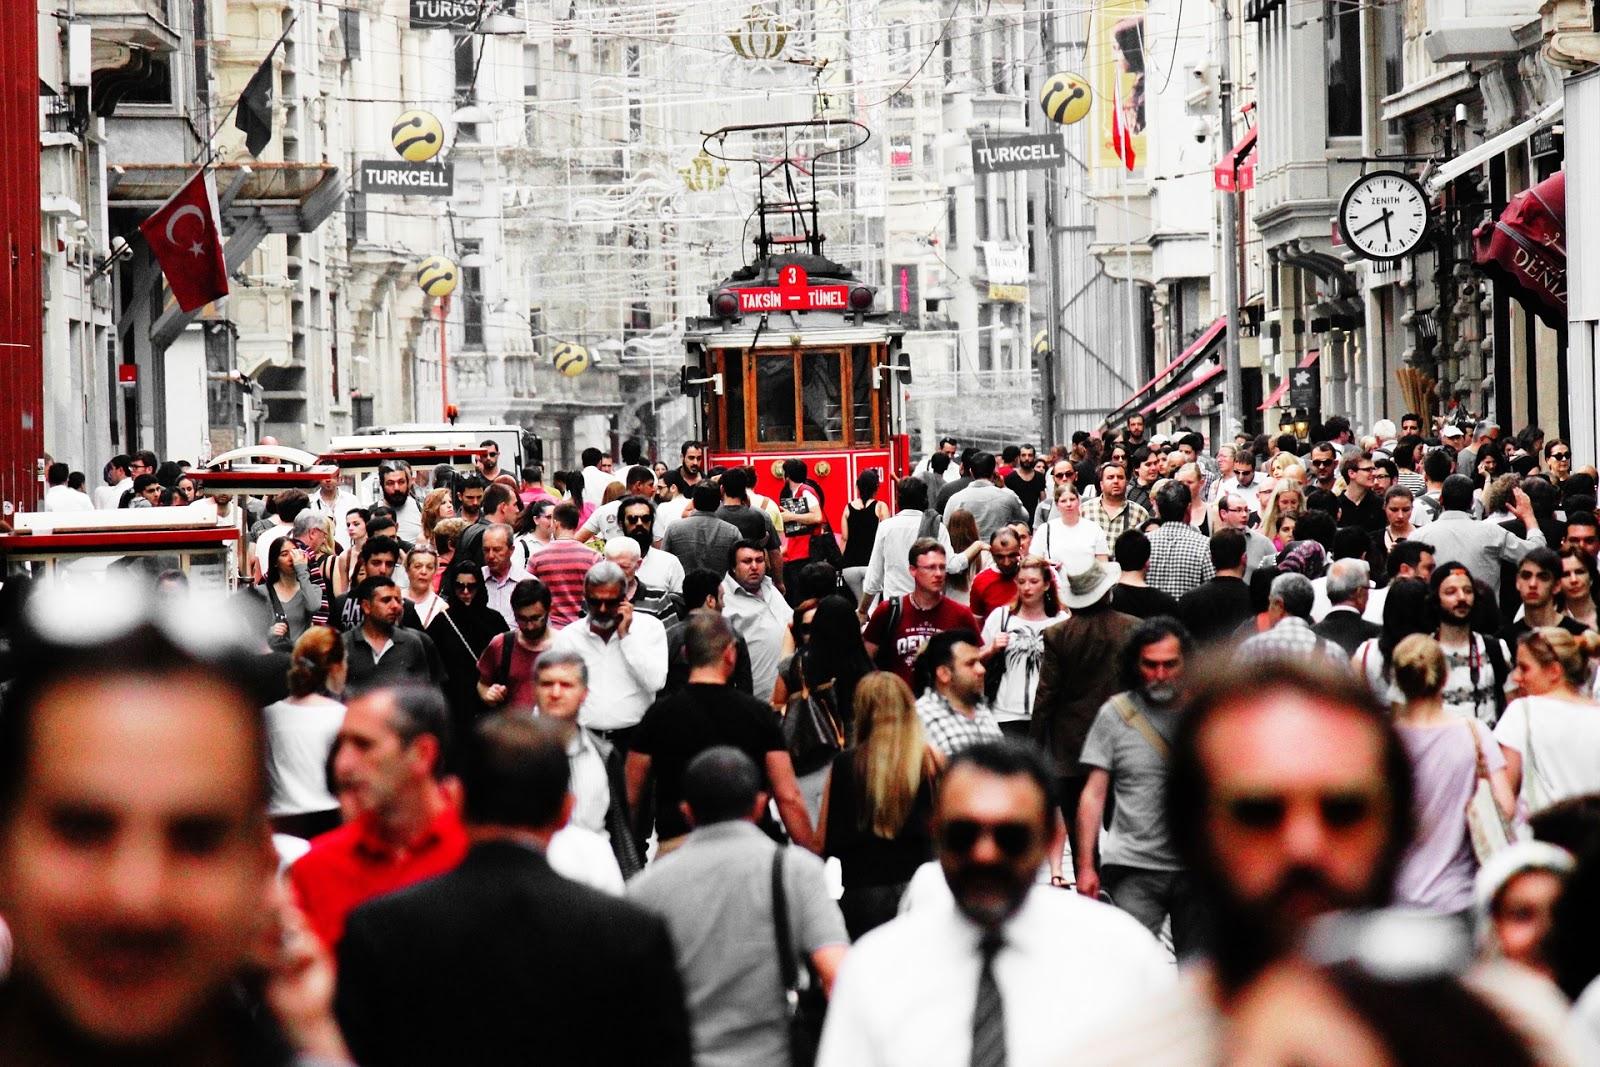 Istanbul population